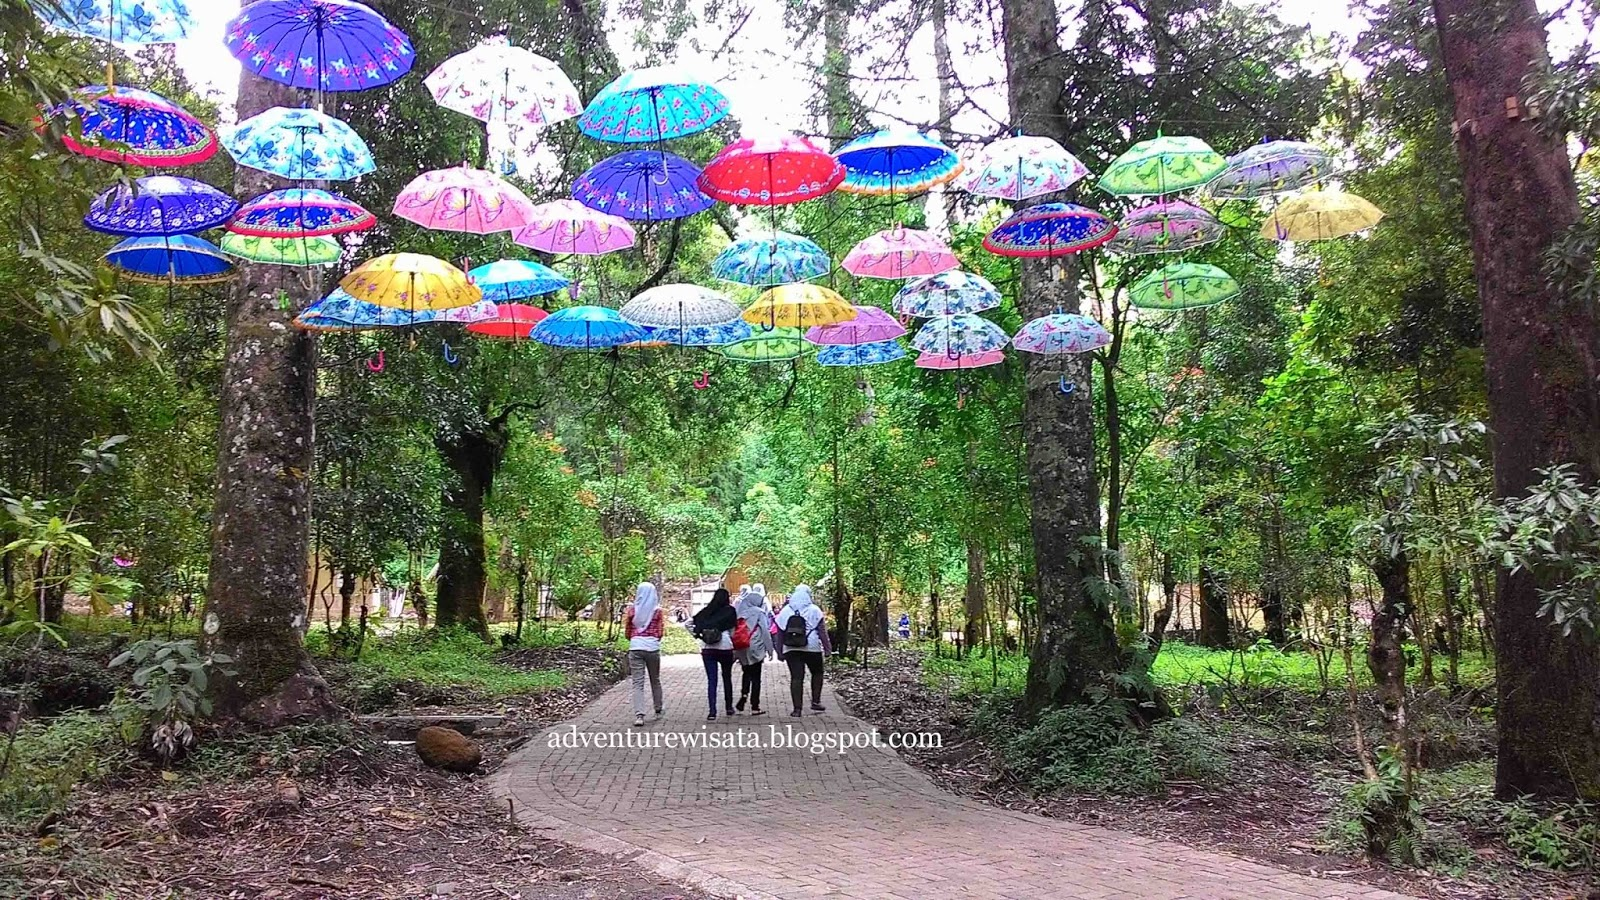 Pesona Pariwisata Seni Budaya Jendela Inspirasi Wisata Alam Mojosemi Forest